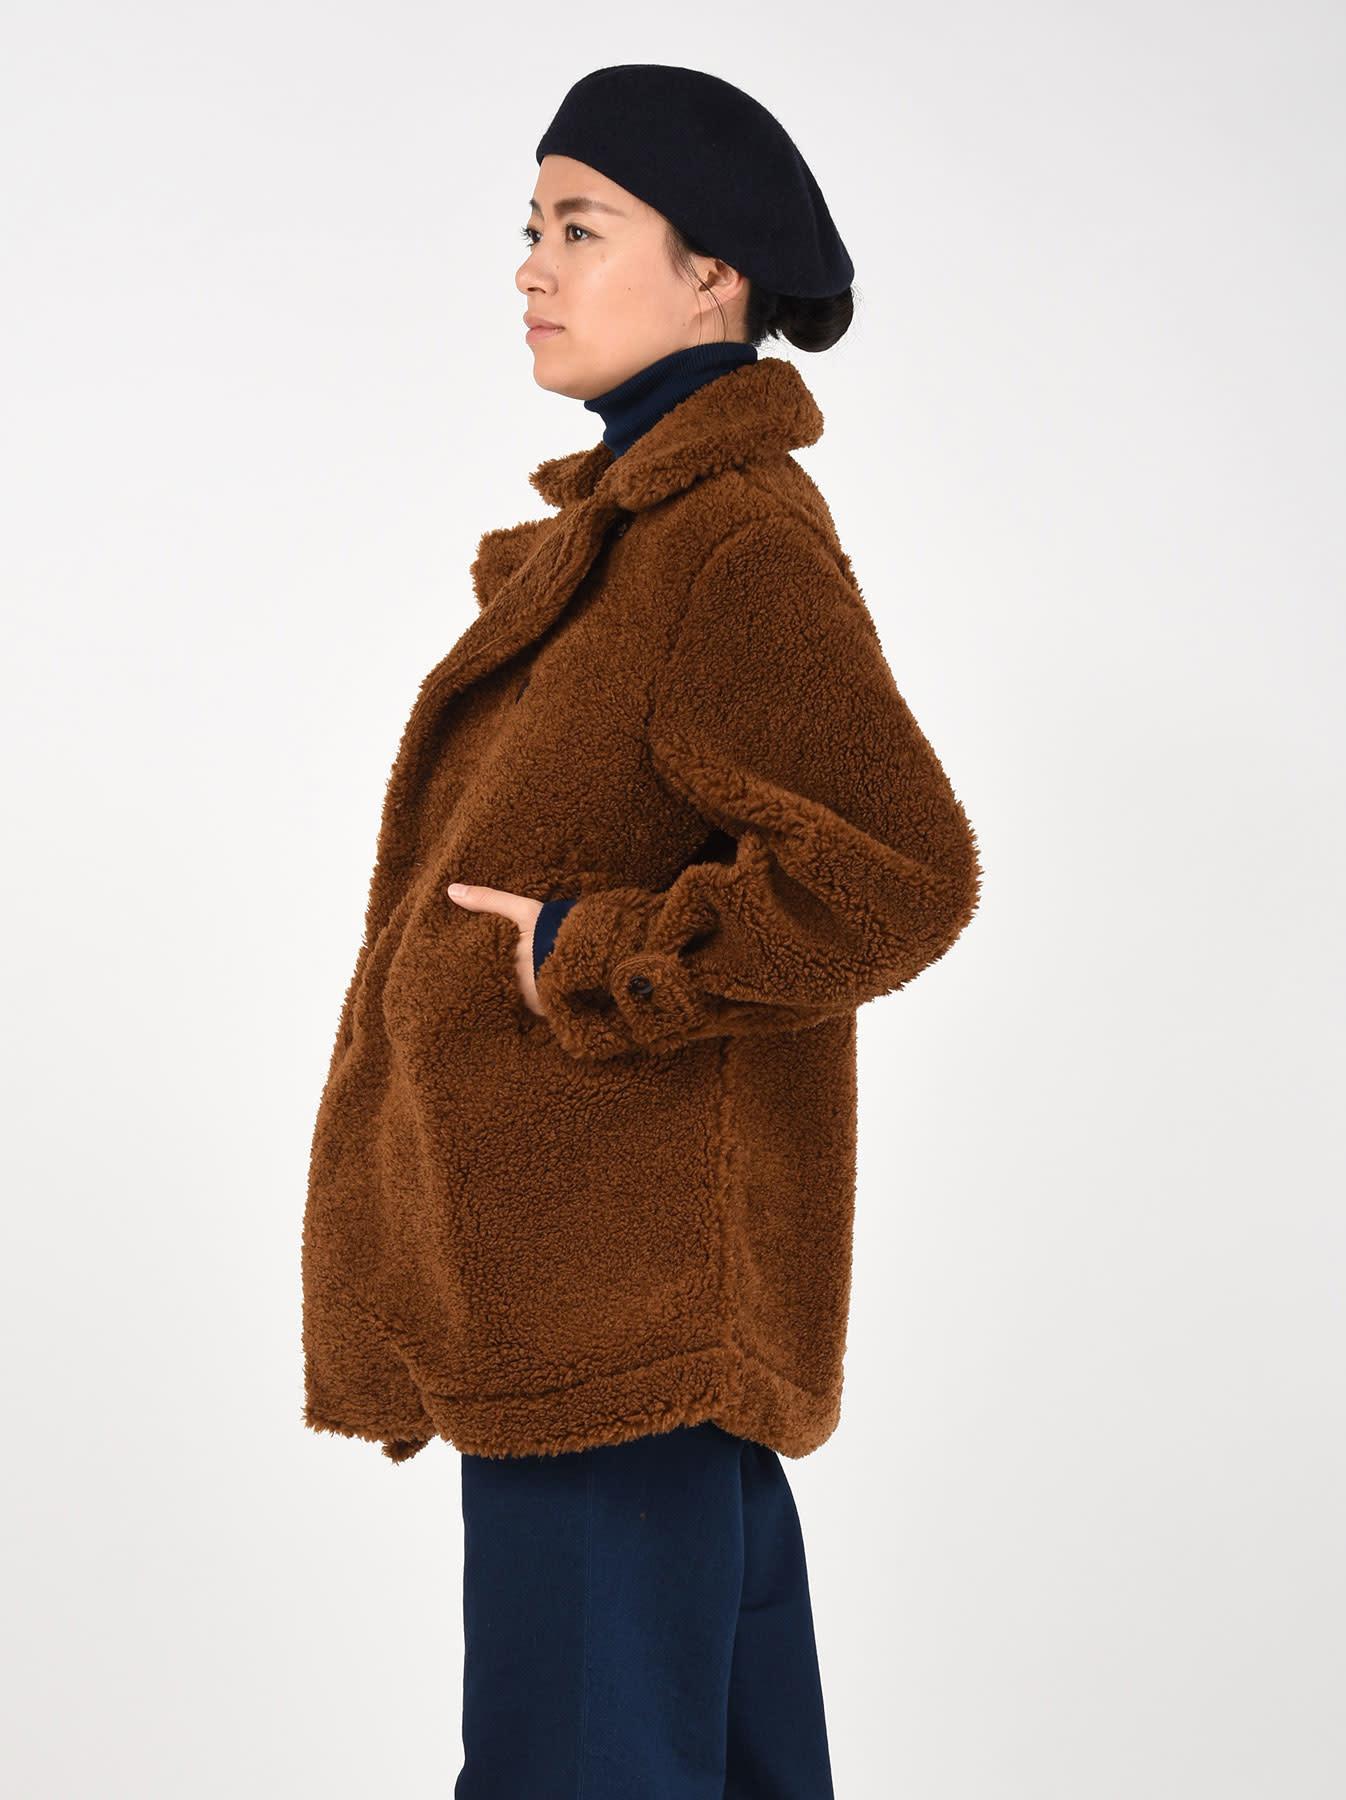 Sheep Boa 908 P-coat-3